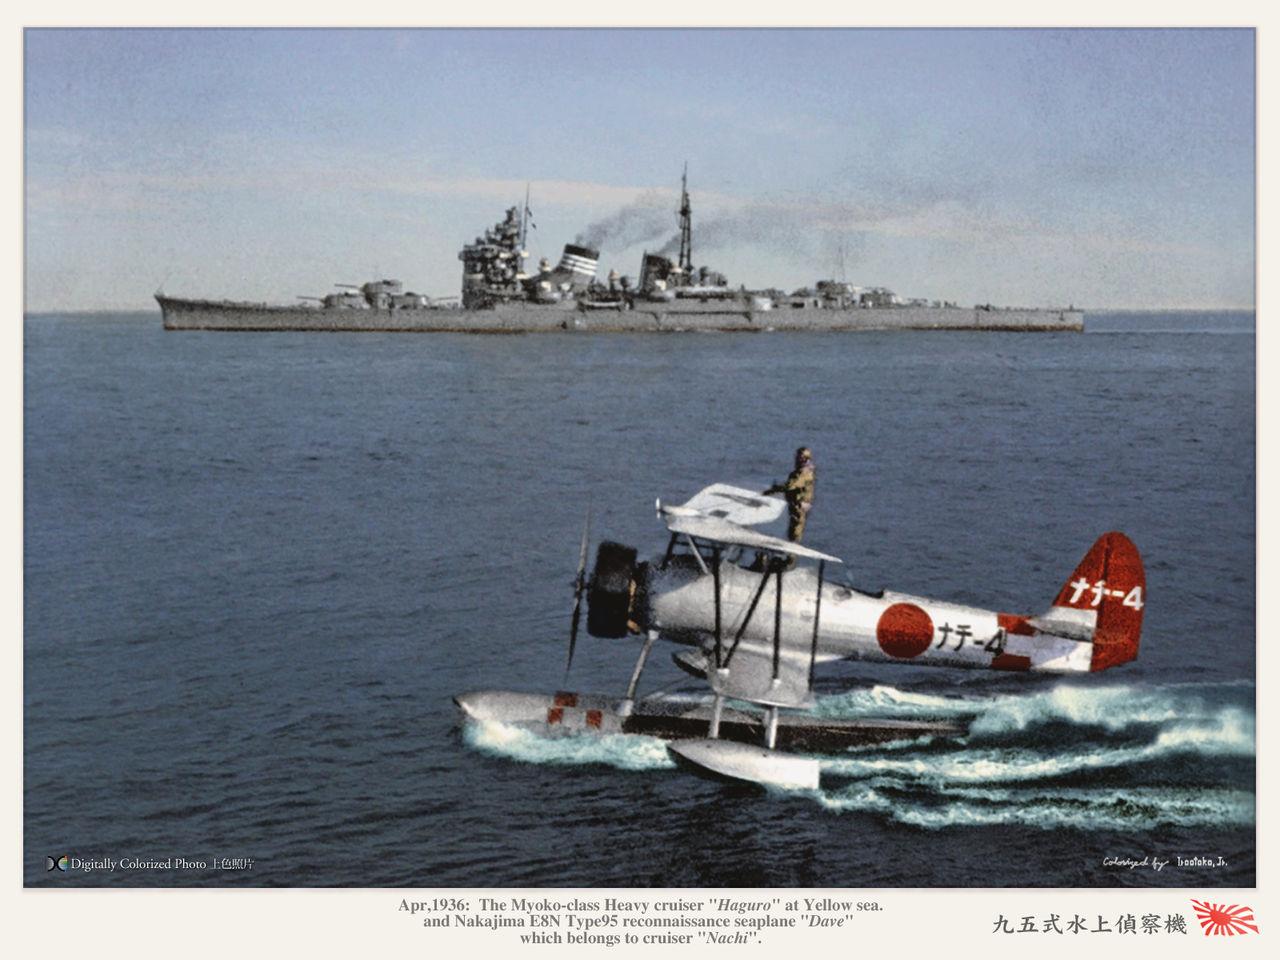 IJN Haguro in the Yellow sea, 1936